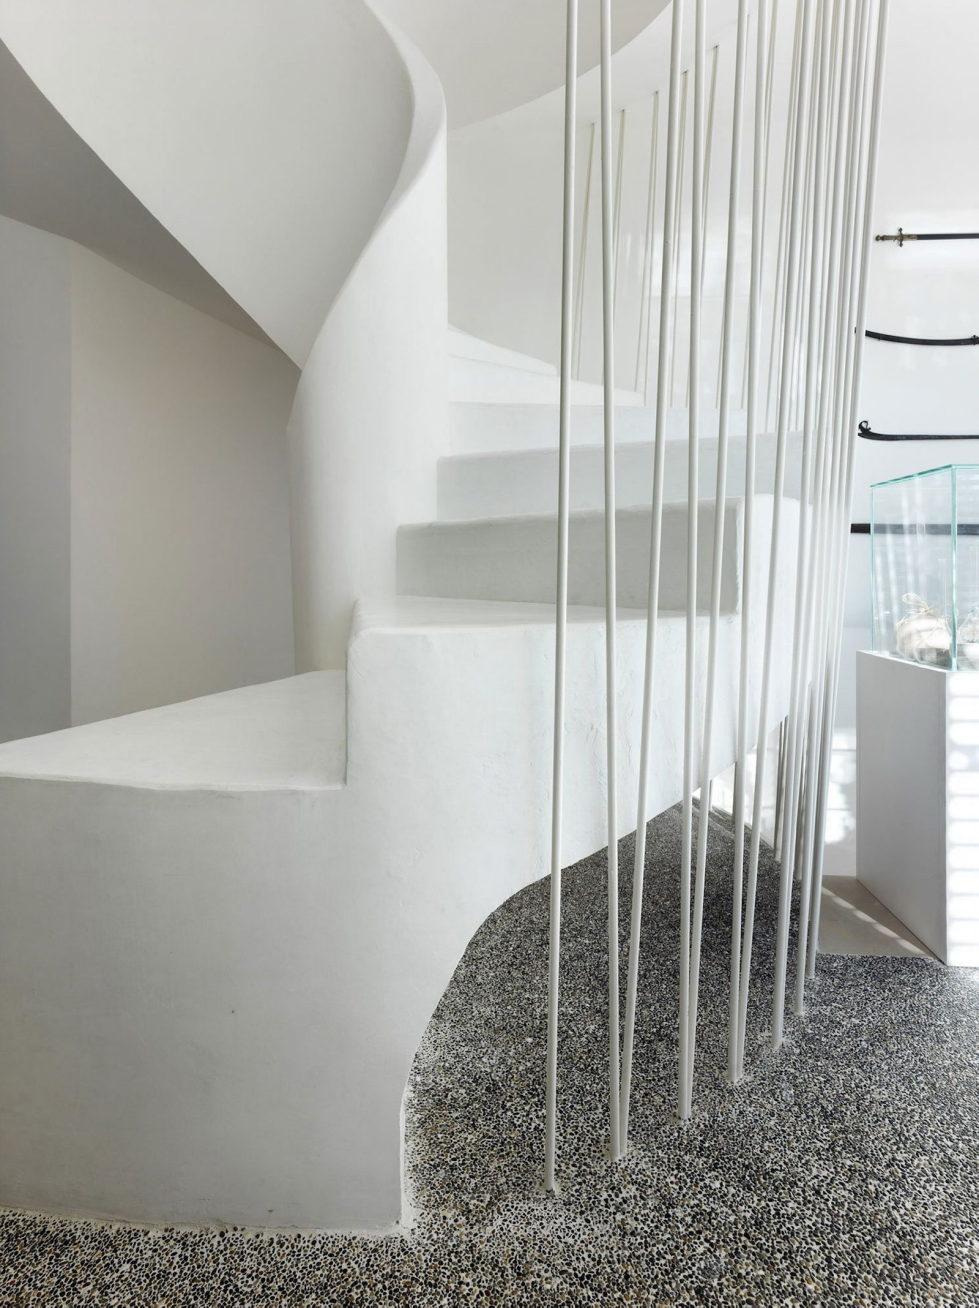 Three-level Apartments In Milan From Arassociati Architetti 9